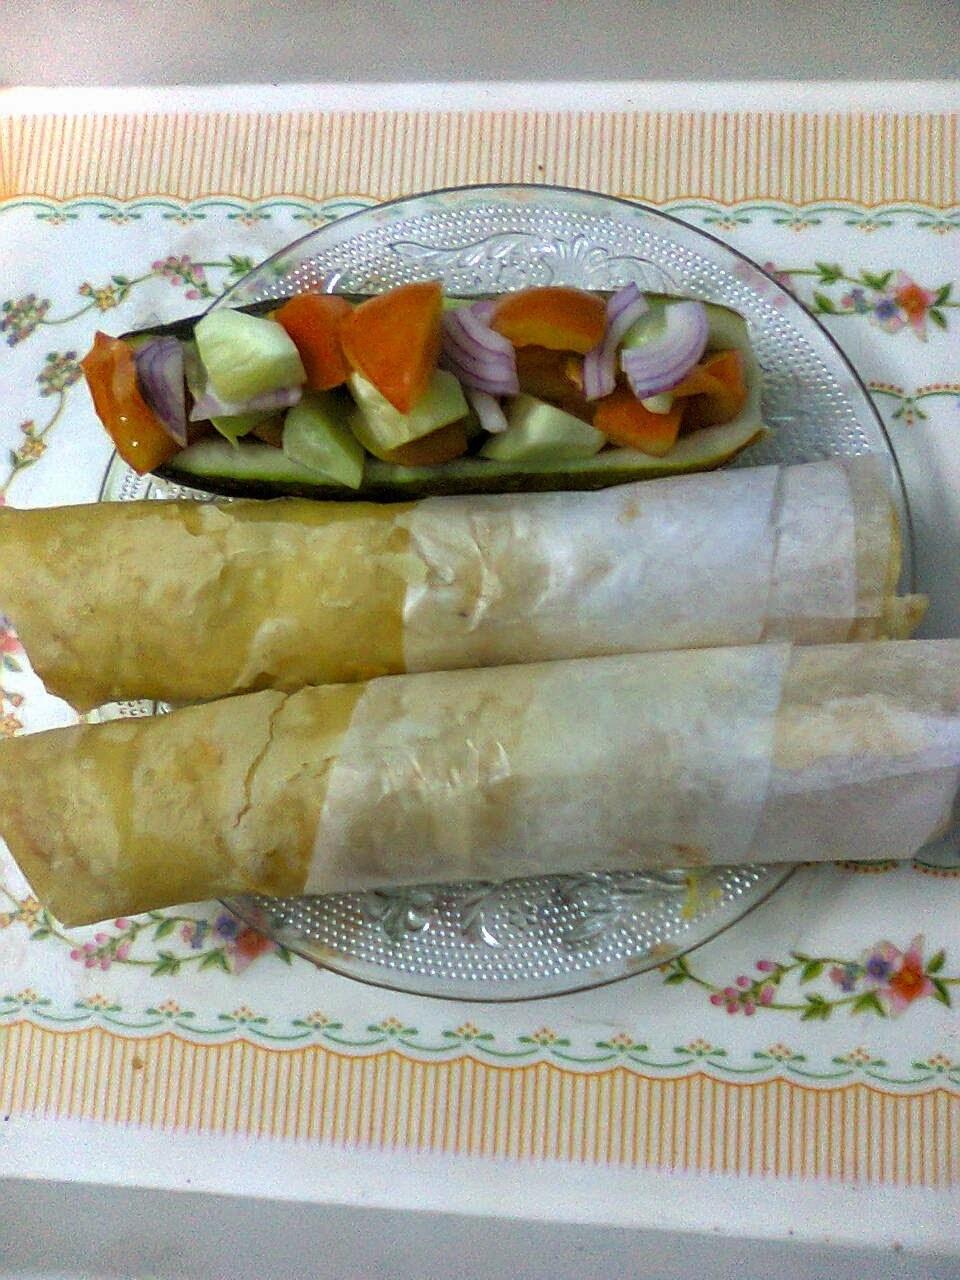 Kolkata Street Food – Egg Roll / Home Made Egg Roll